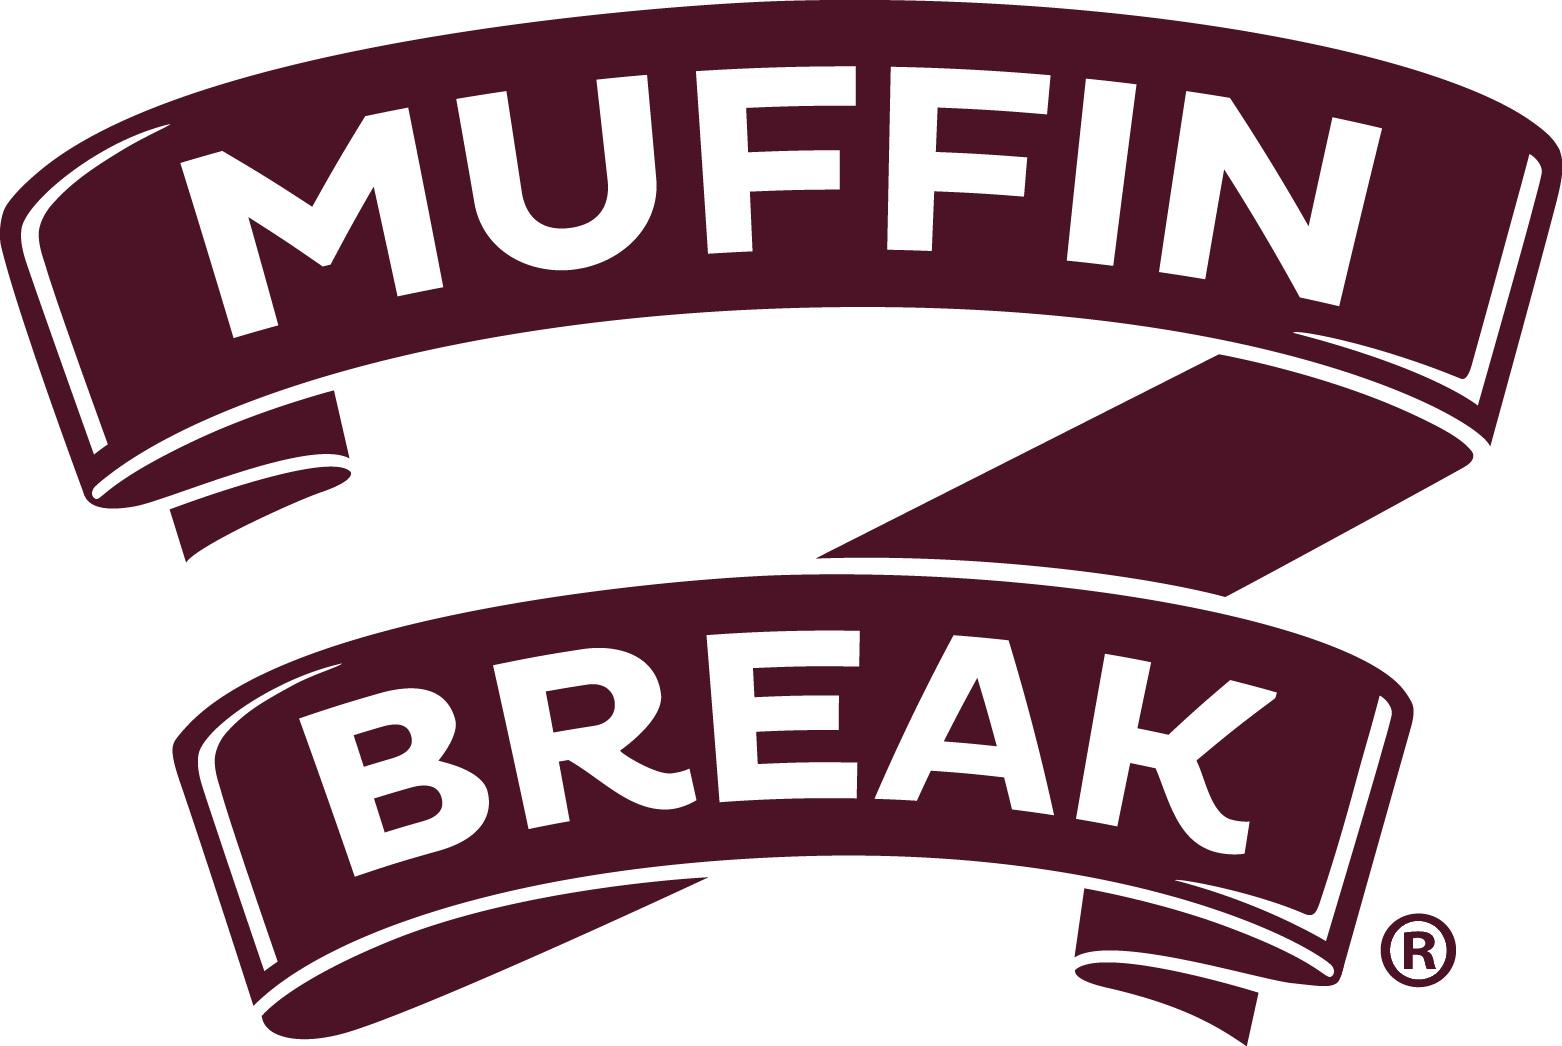 Break casey central. Muffins clipart bran muffin